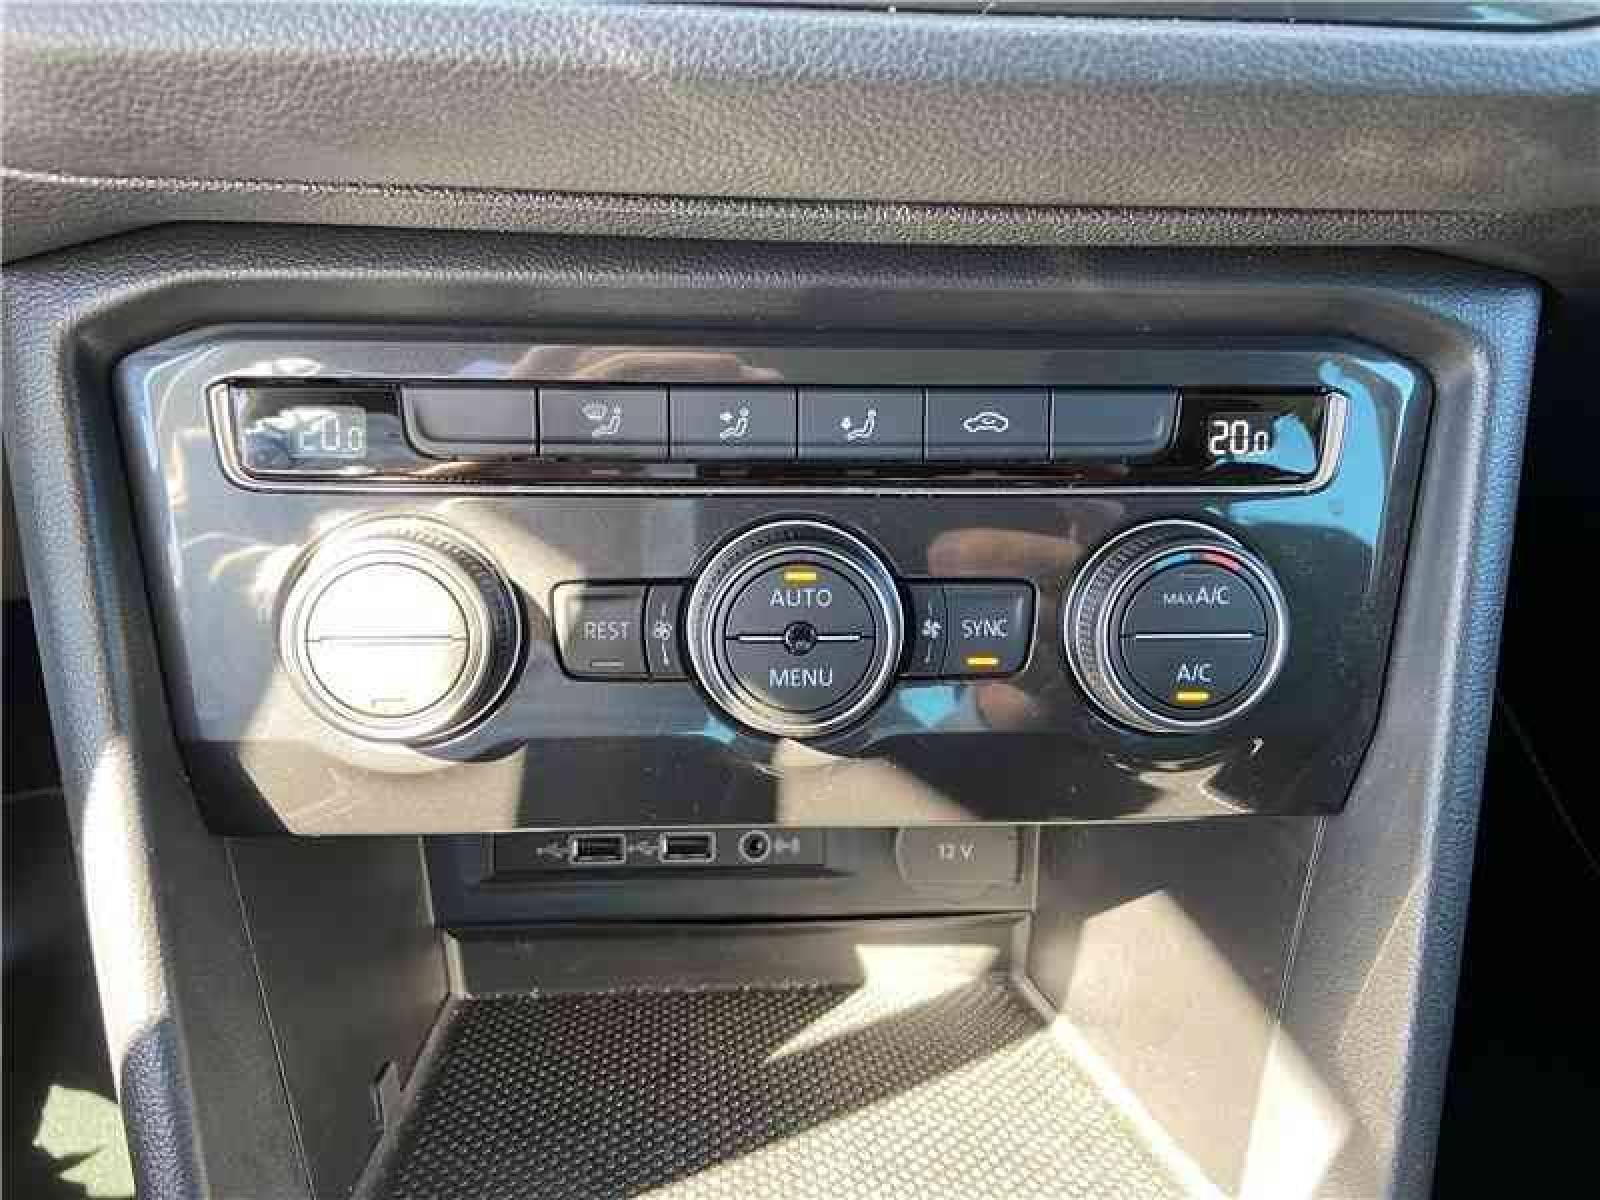 VOLKSWAGEN Tiguan 1.5 TSI EVO 150 - véhicule d'occasion - LEMAUVIEL AUTOMOBILES - Présentation site web V2 - Lemauviel Automobiles - VIRE - 14500 - VIRE - 17